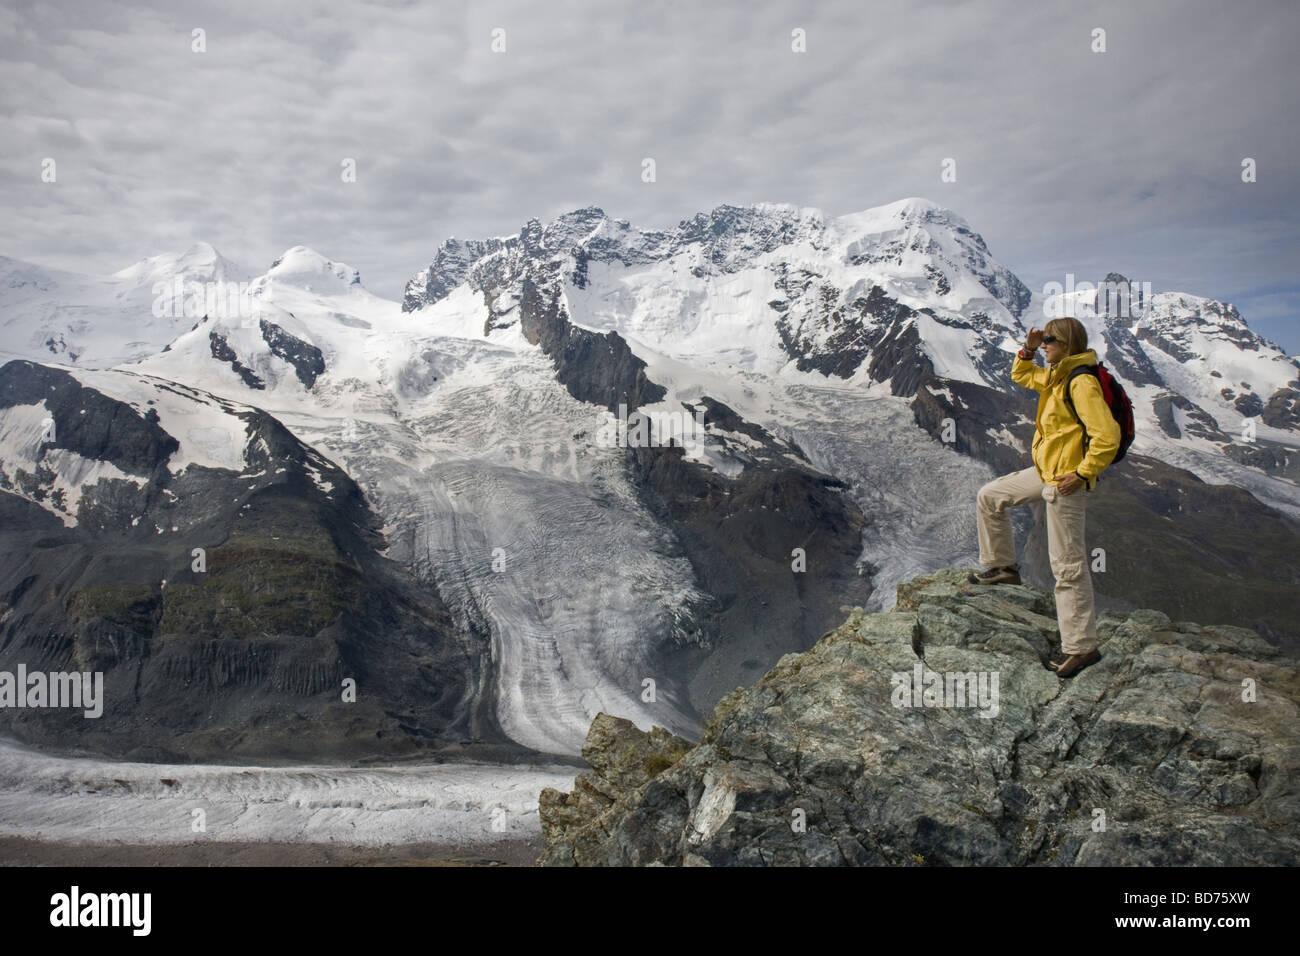 Young woman in Gornetgrat glacier Switzerland - Stock Image